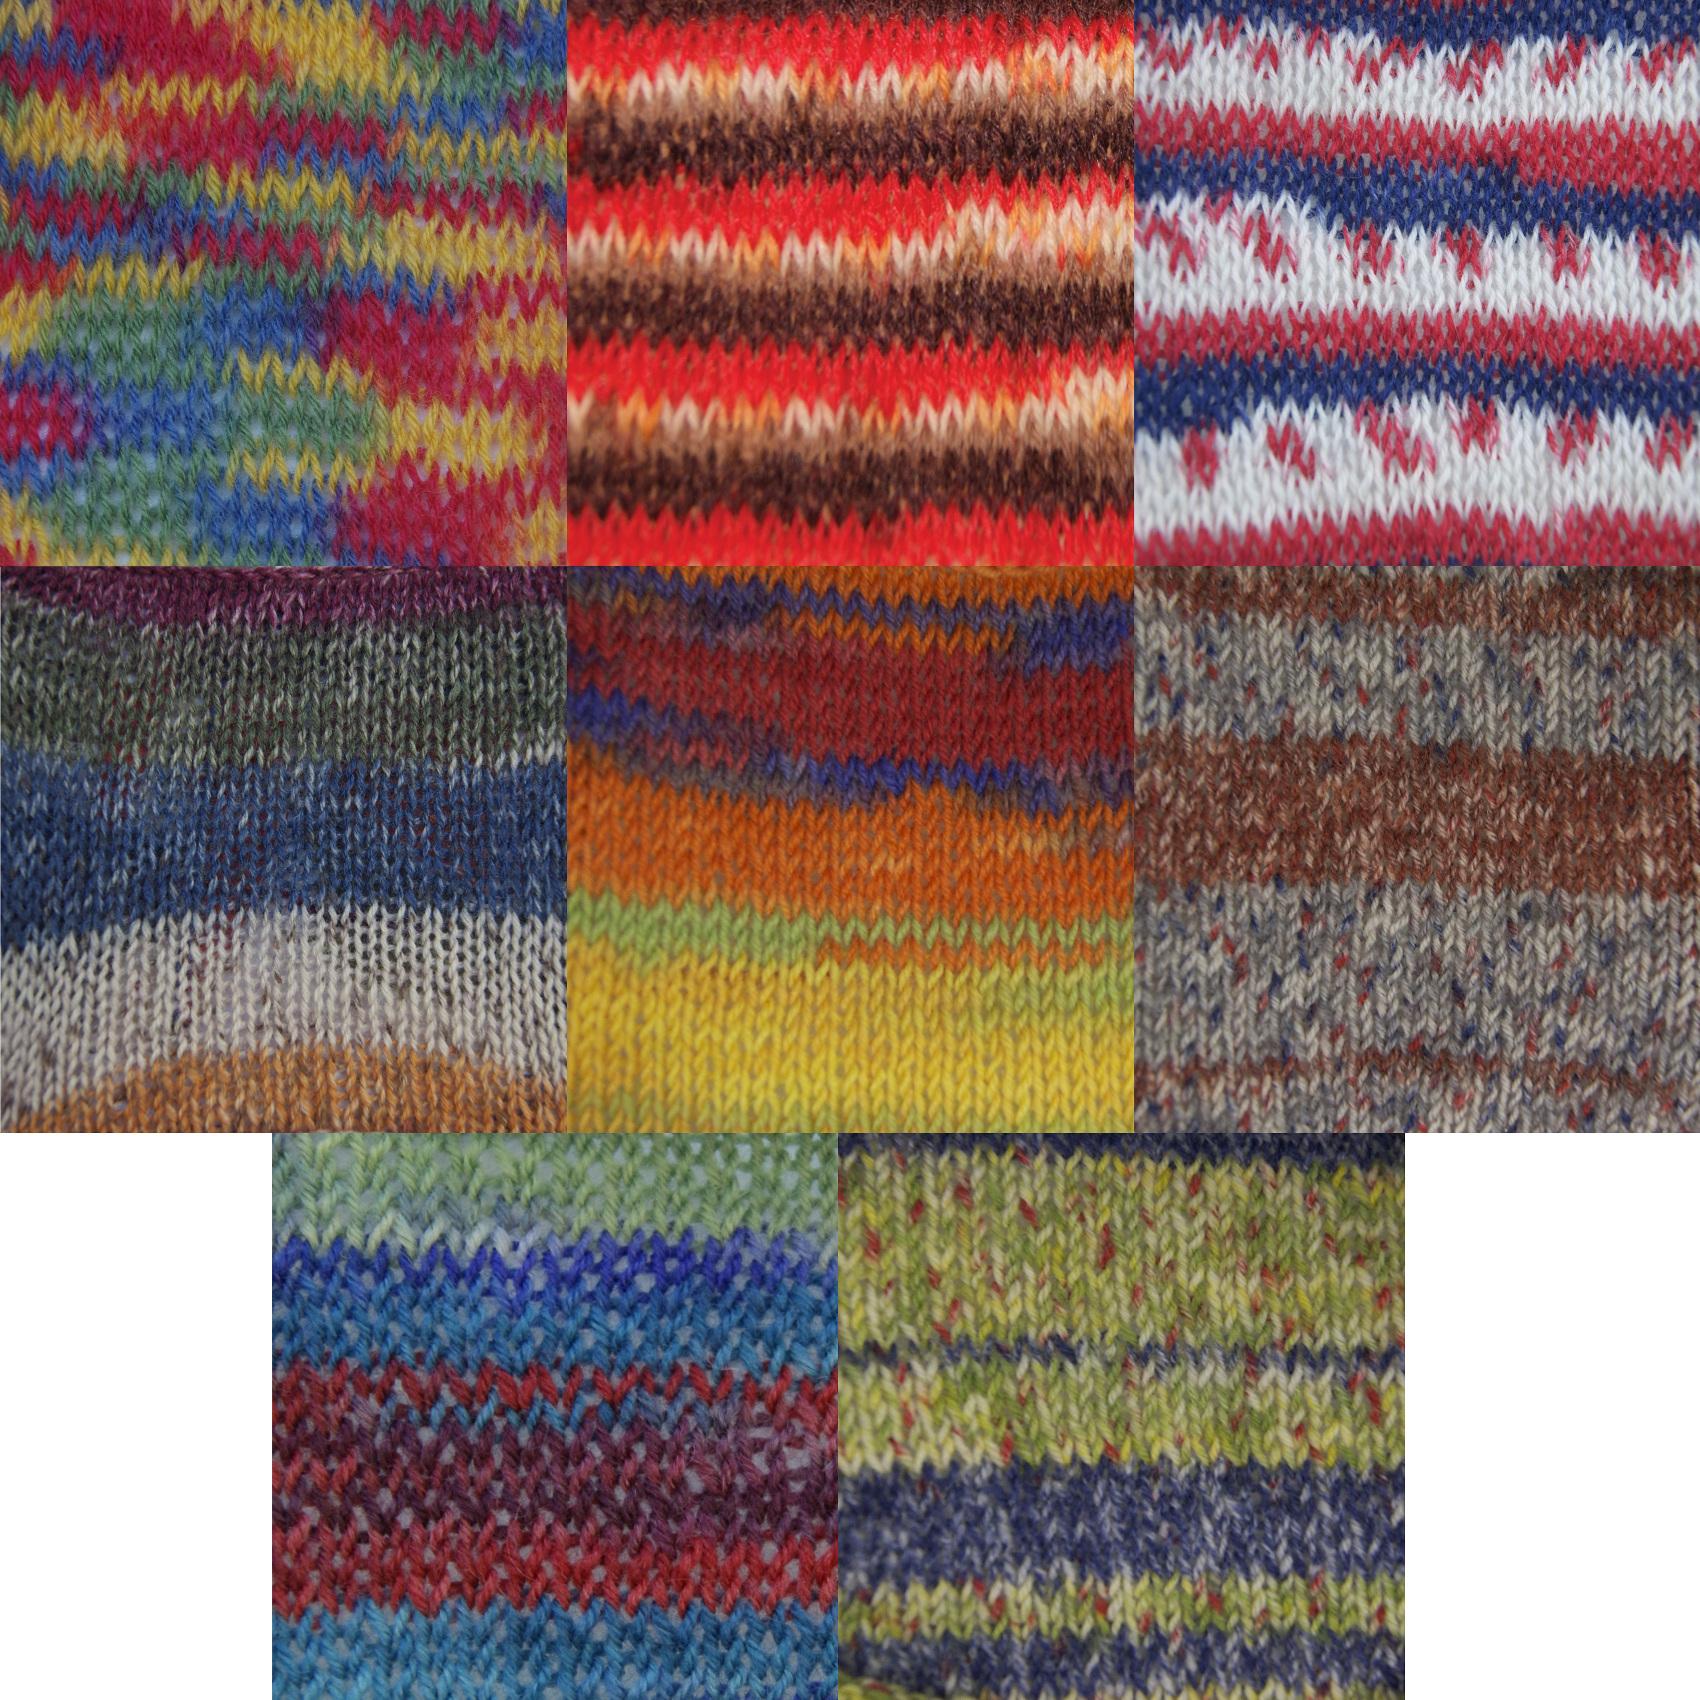 Knitting Patterns 4 Ply Wool : Zig Zag 4Ply 100g Ball Superwash Knitting Wool & Nylon Soft Sock Yarn Kin...